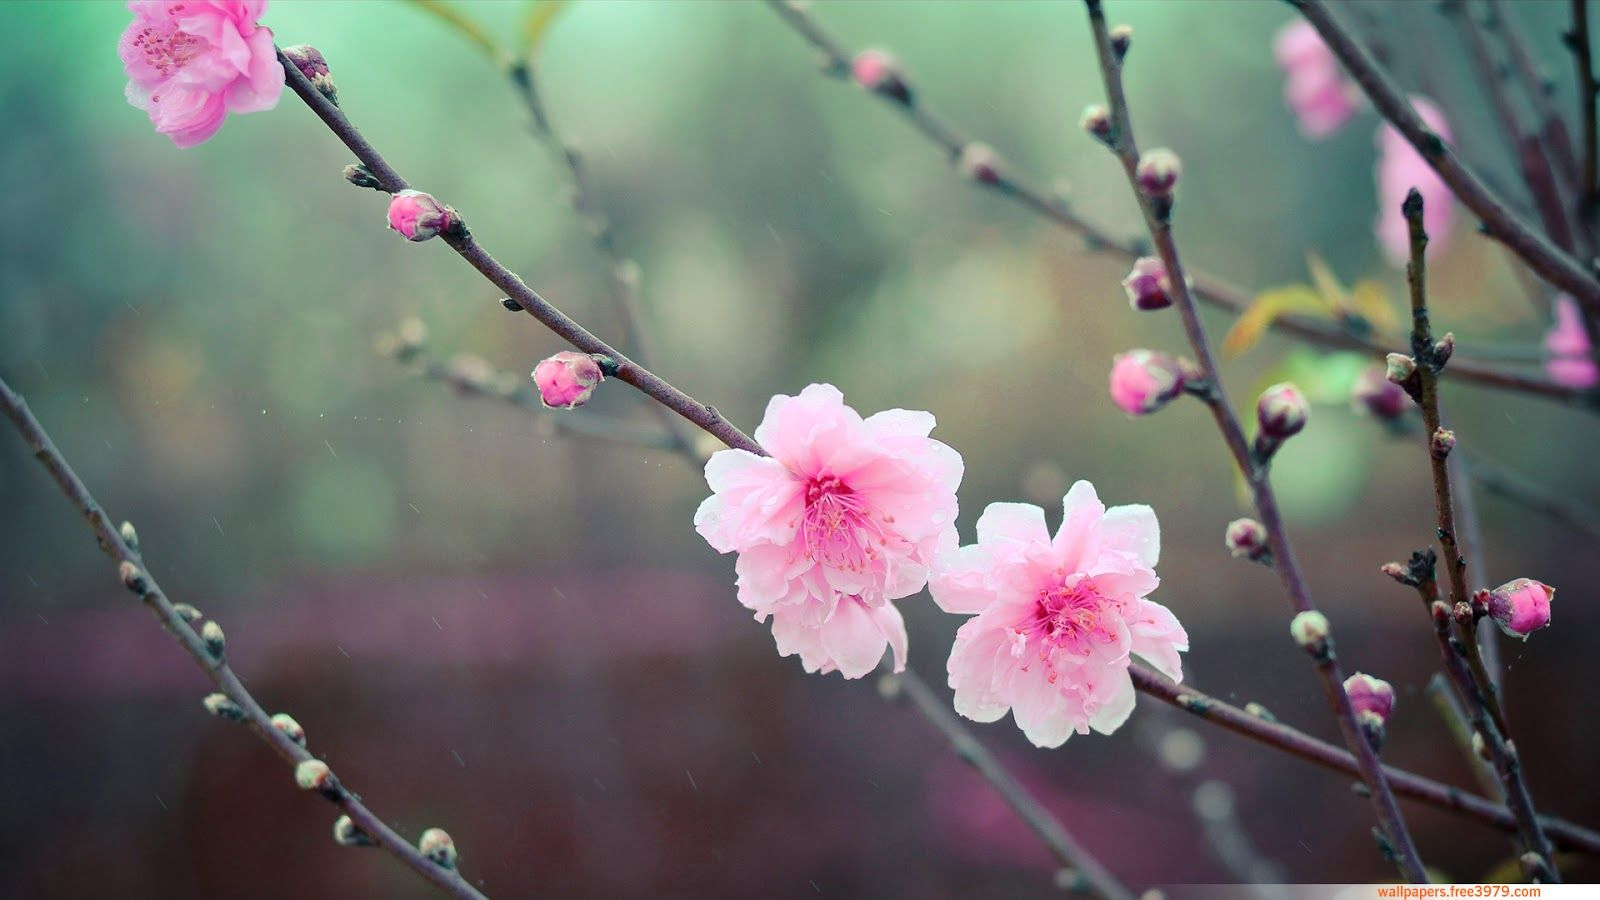 Images For Cherry Blossom Cover Photos Cherry Blossom Flowers Cherry Blossom Wallpaper Cherry Flower